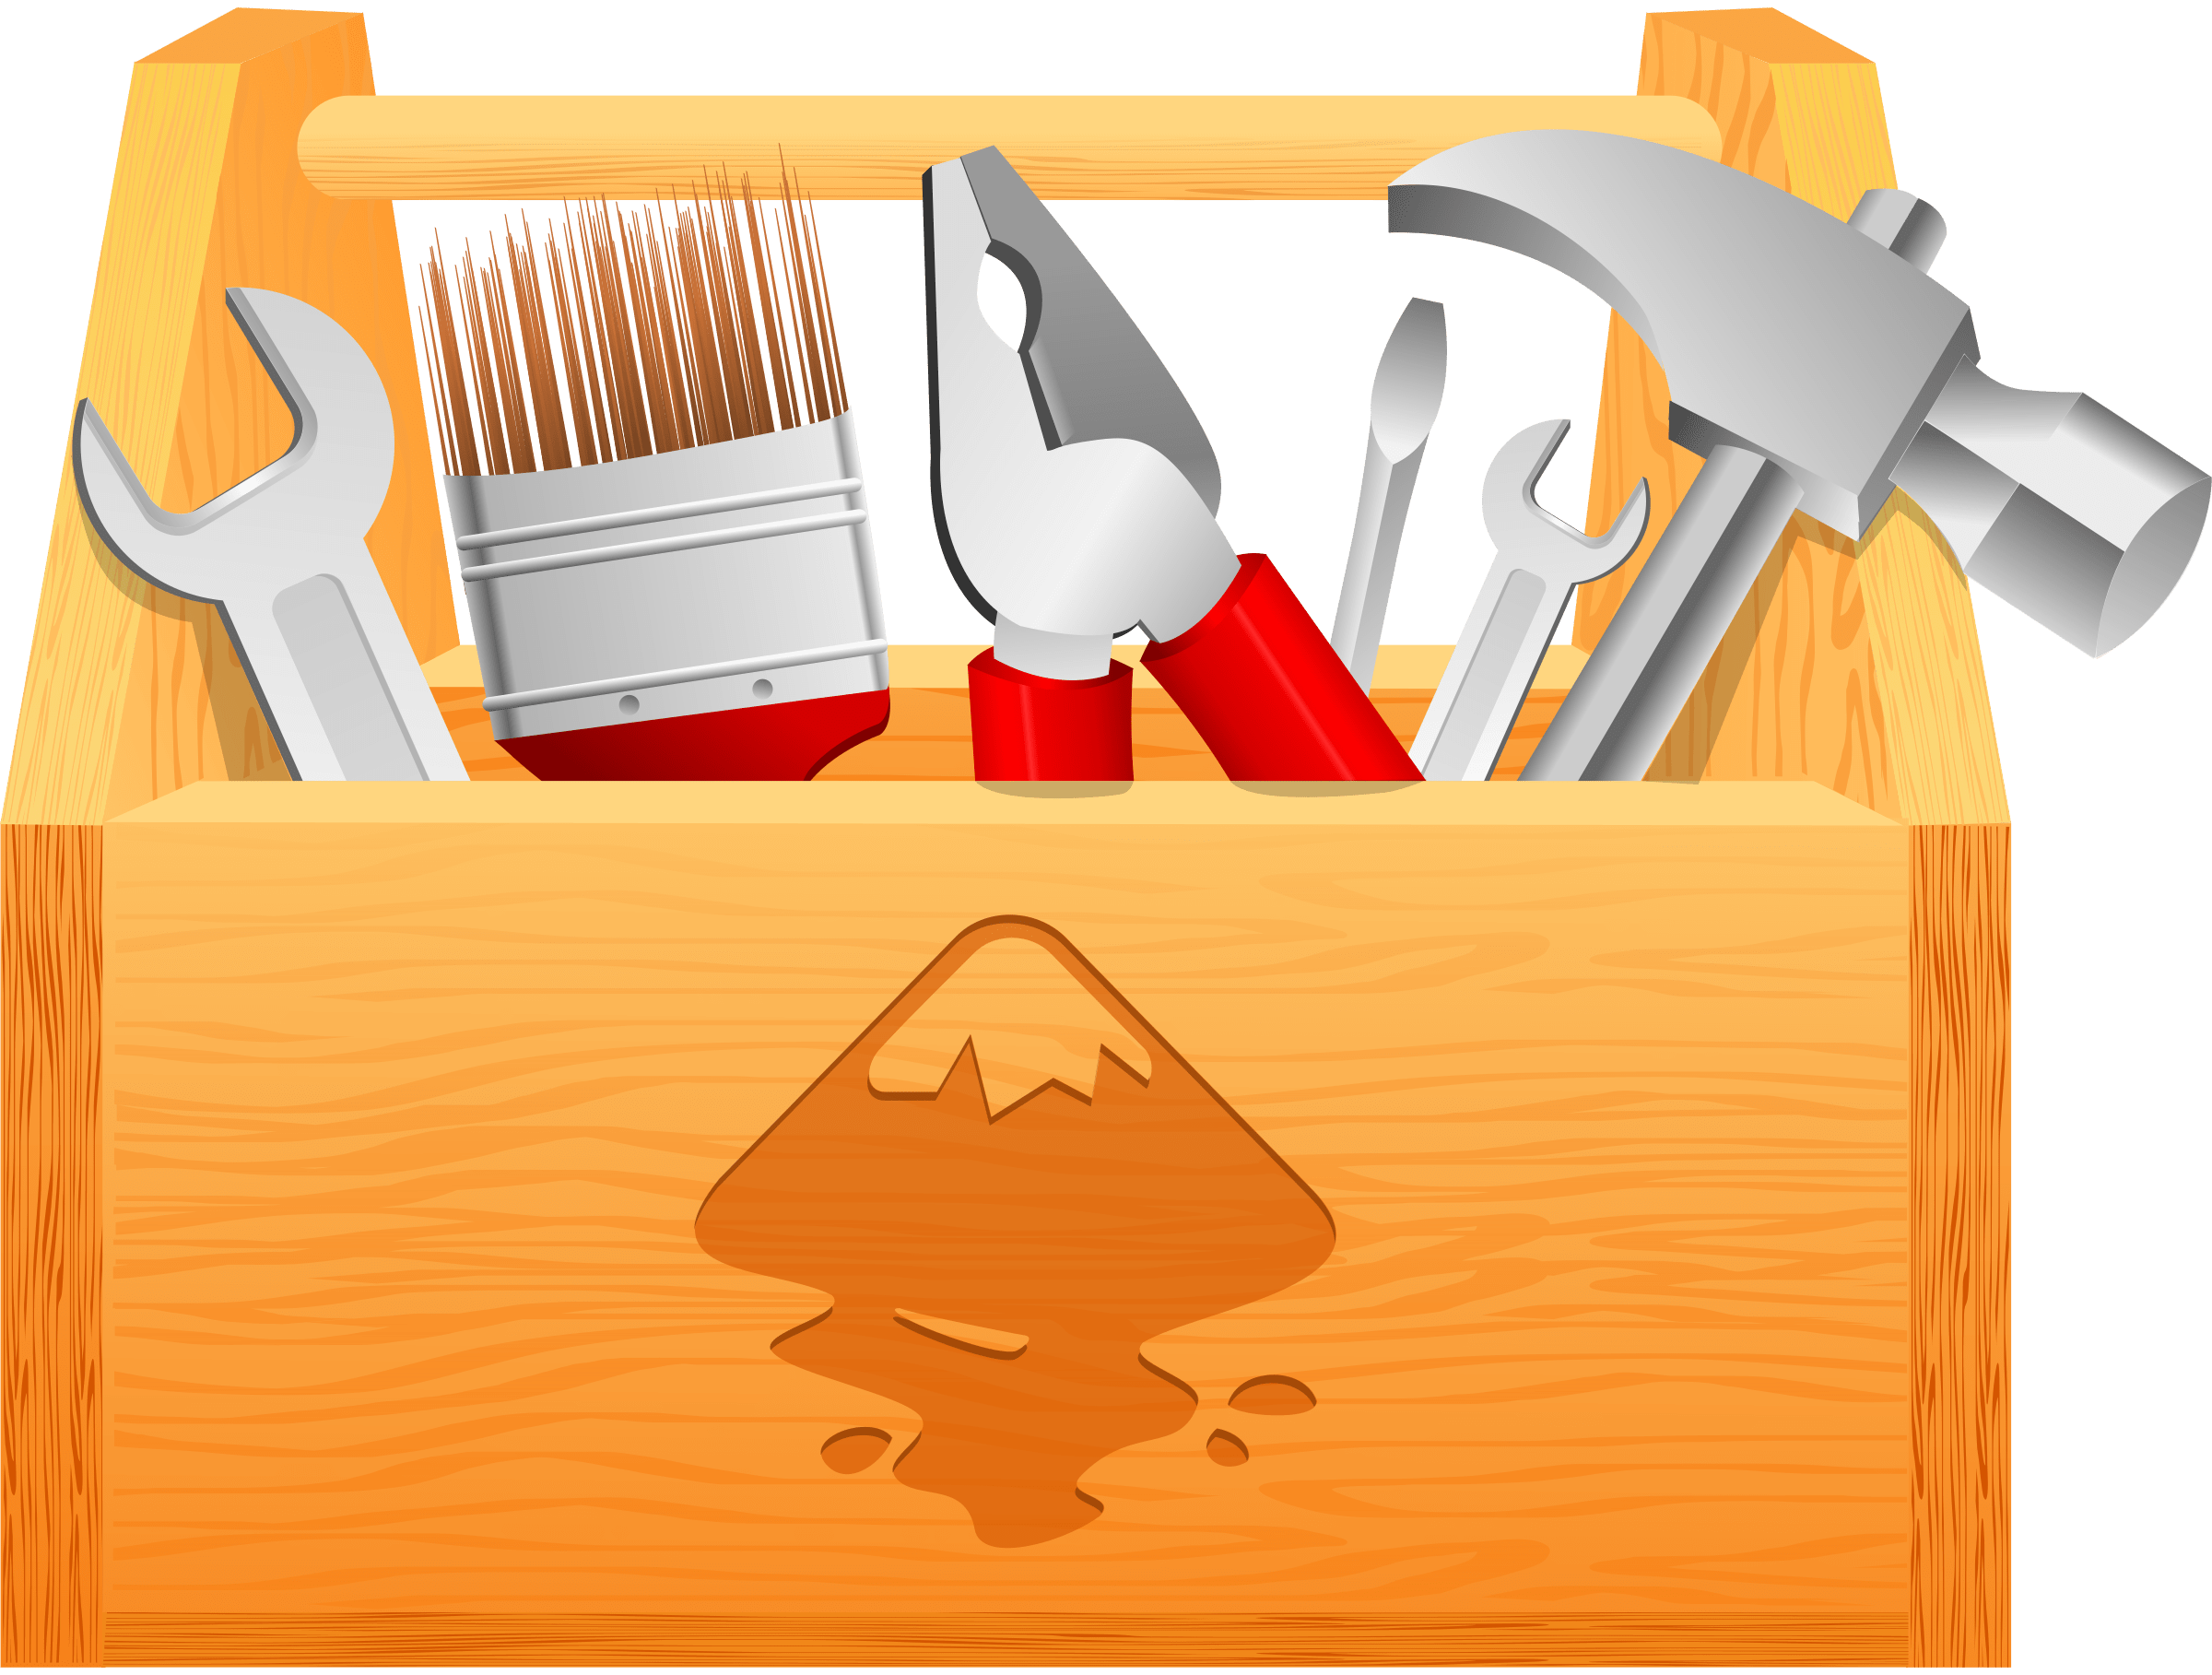 graphic freeuse library Carpenter Tool Box Clip Art